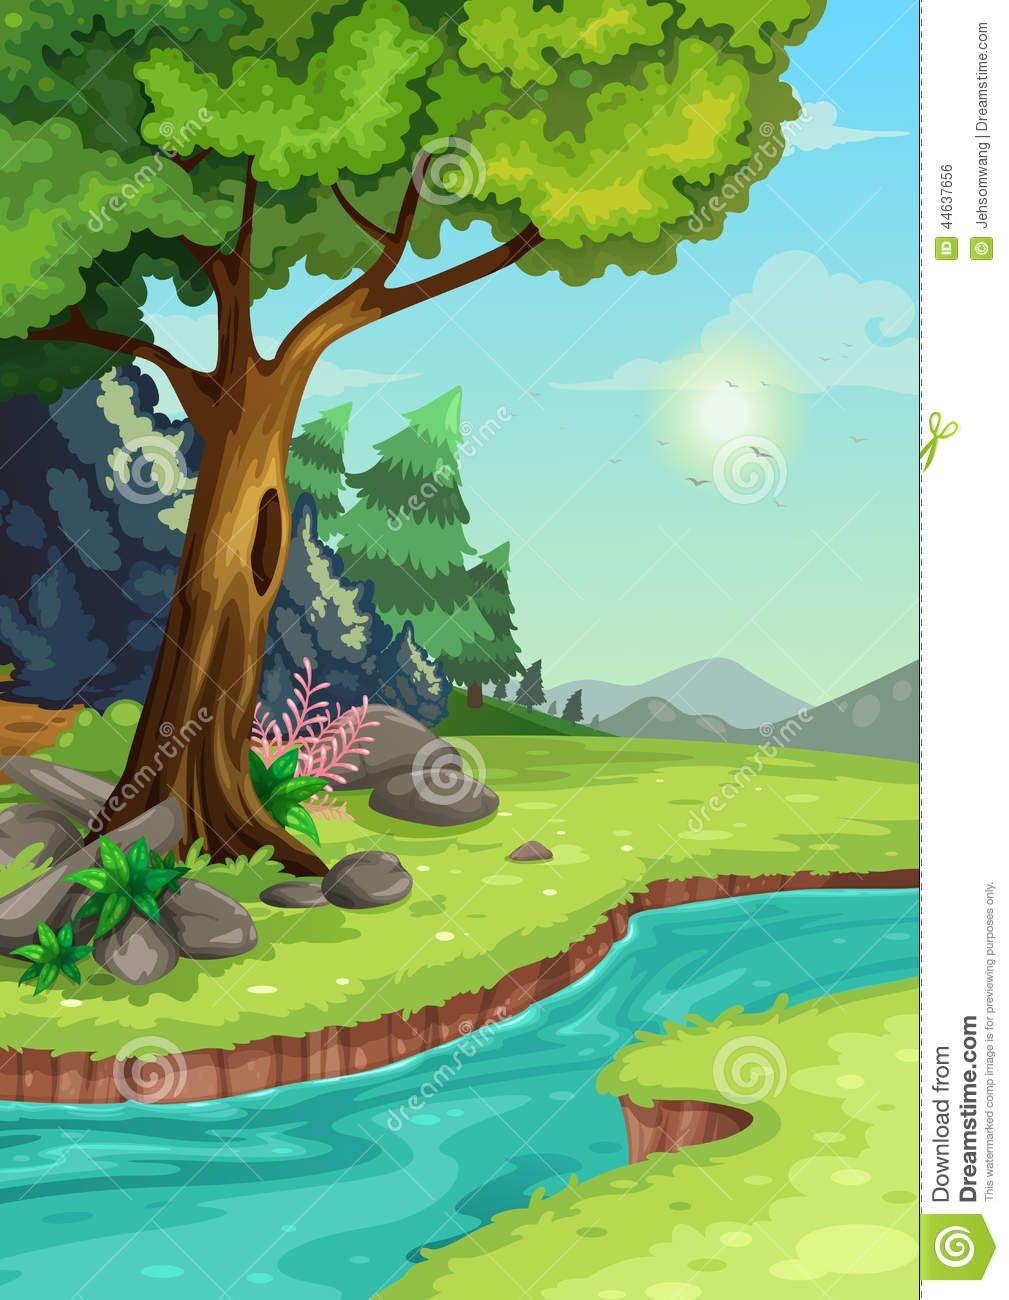 Imagen Relacionada Scenery Drawing For Kids Forest Drawing Kids Room Murals